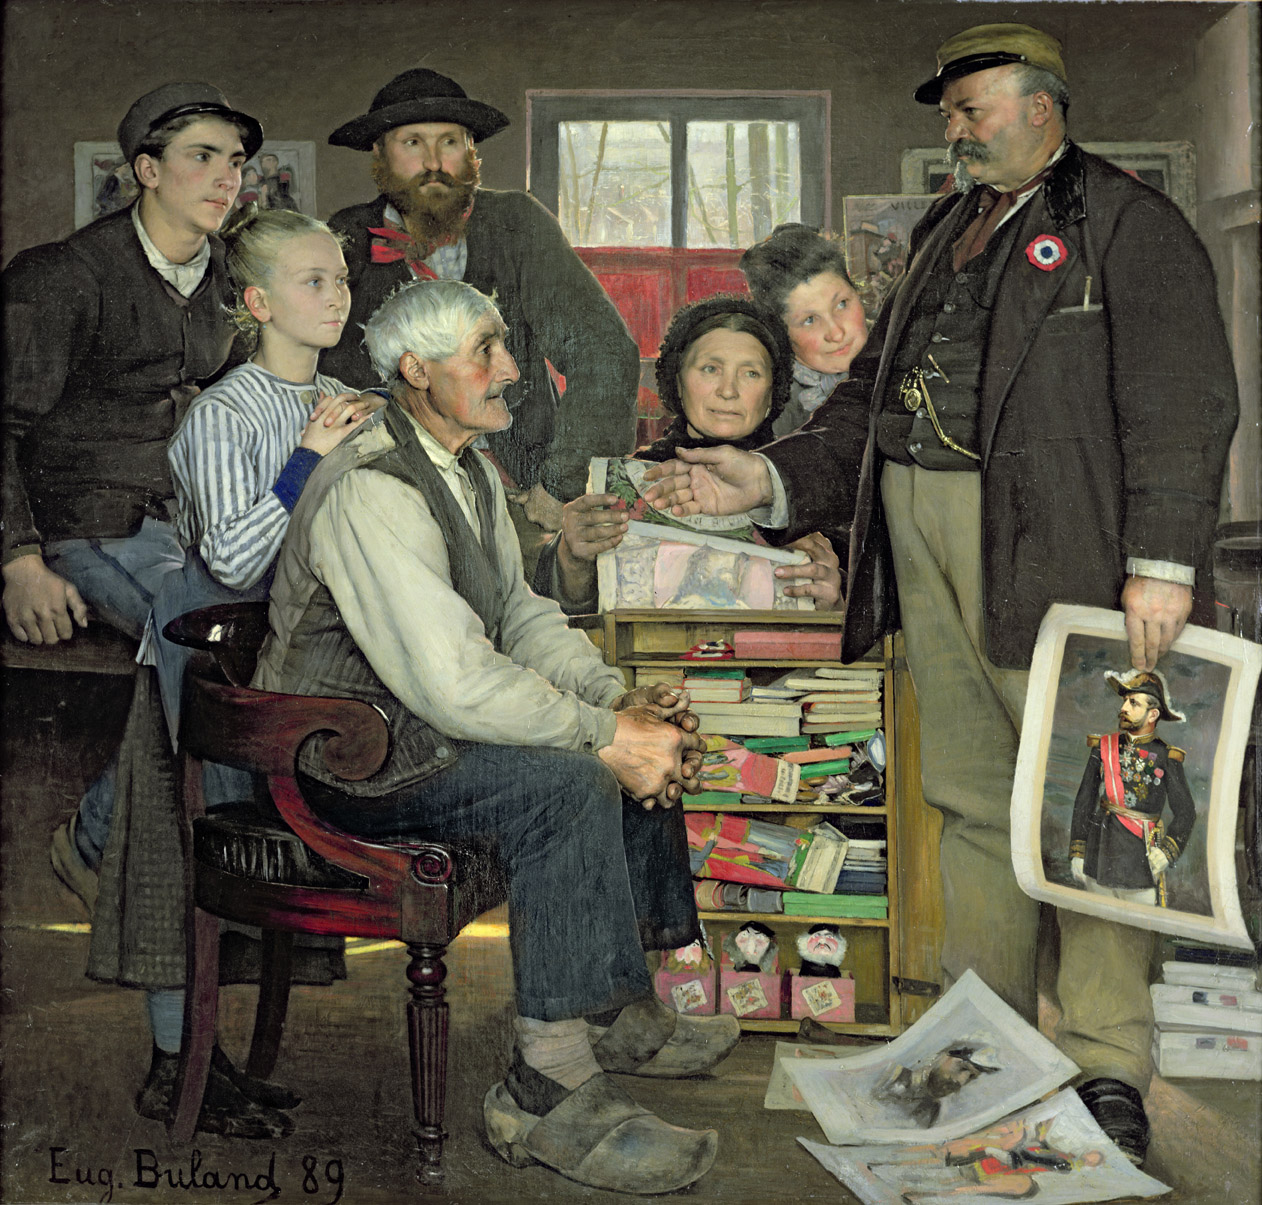 Propaganda, by Eugène Buland, 1889. Musee d'Orsay, Paris.